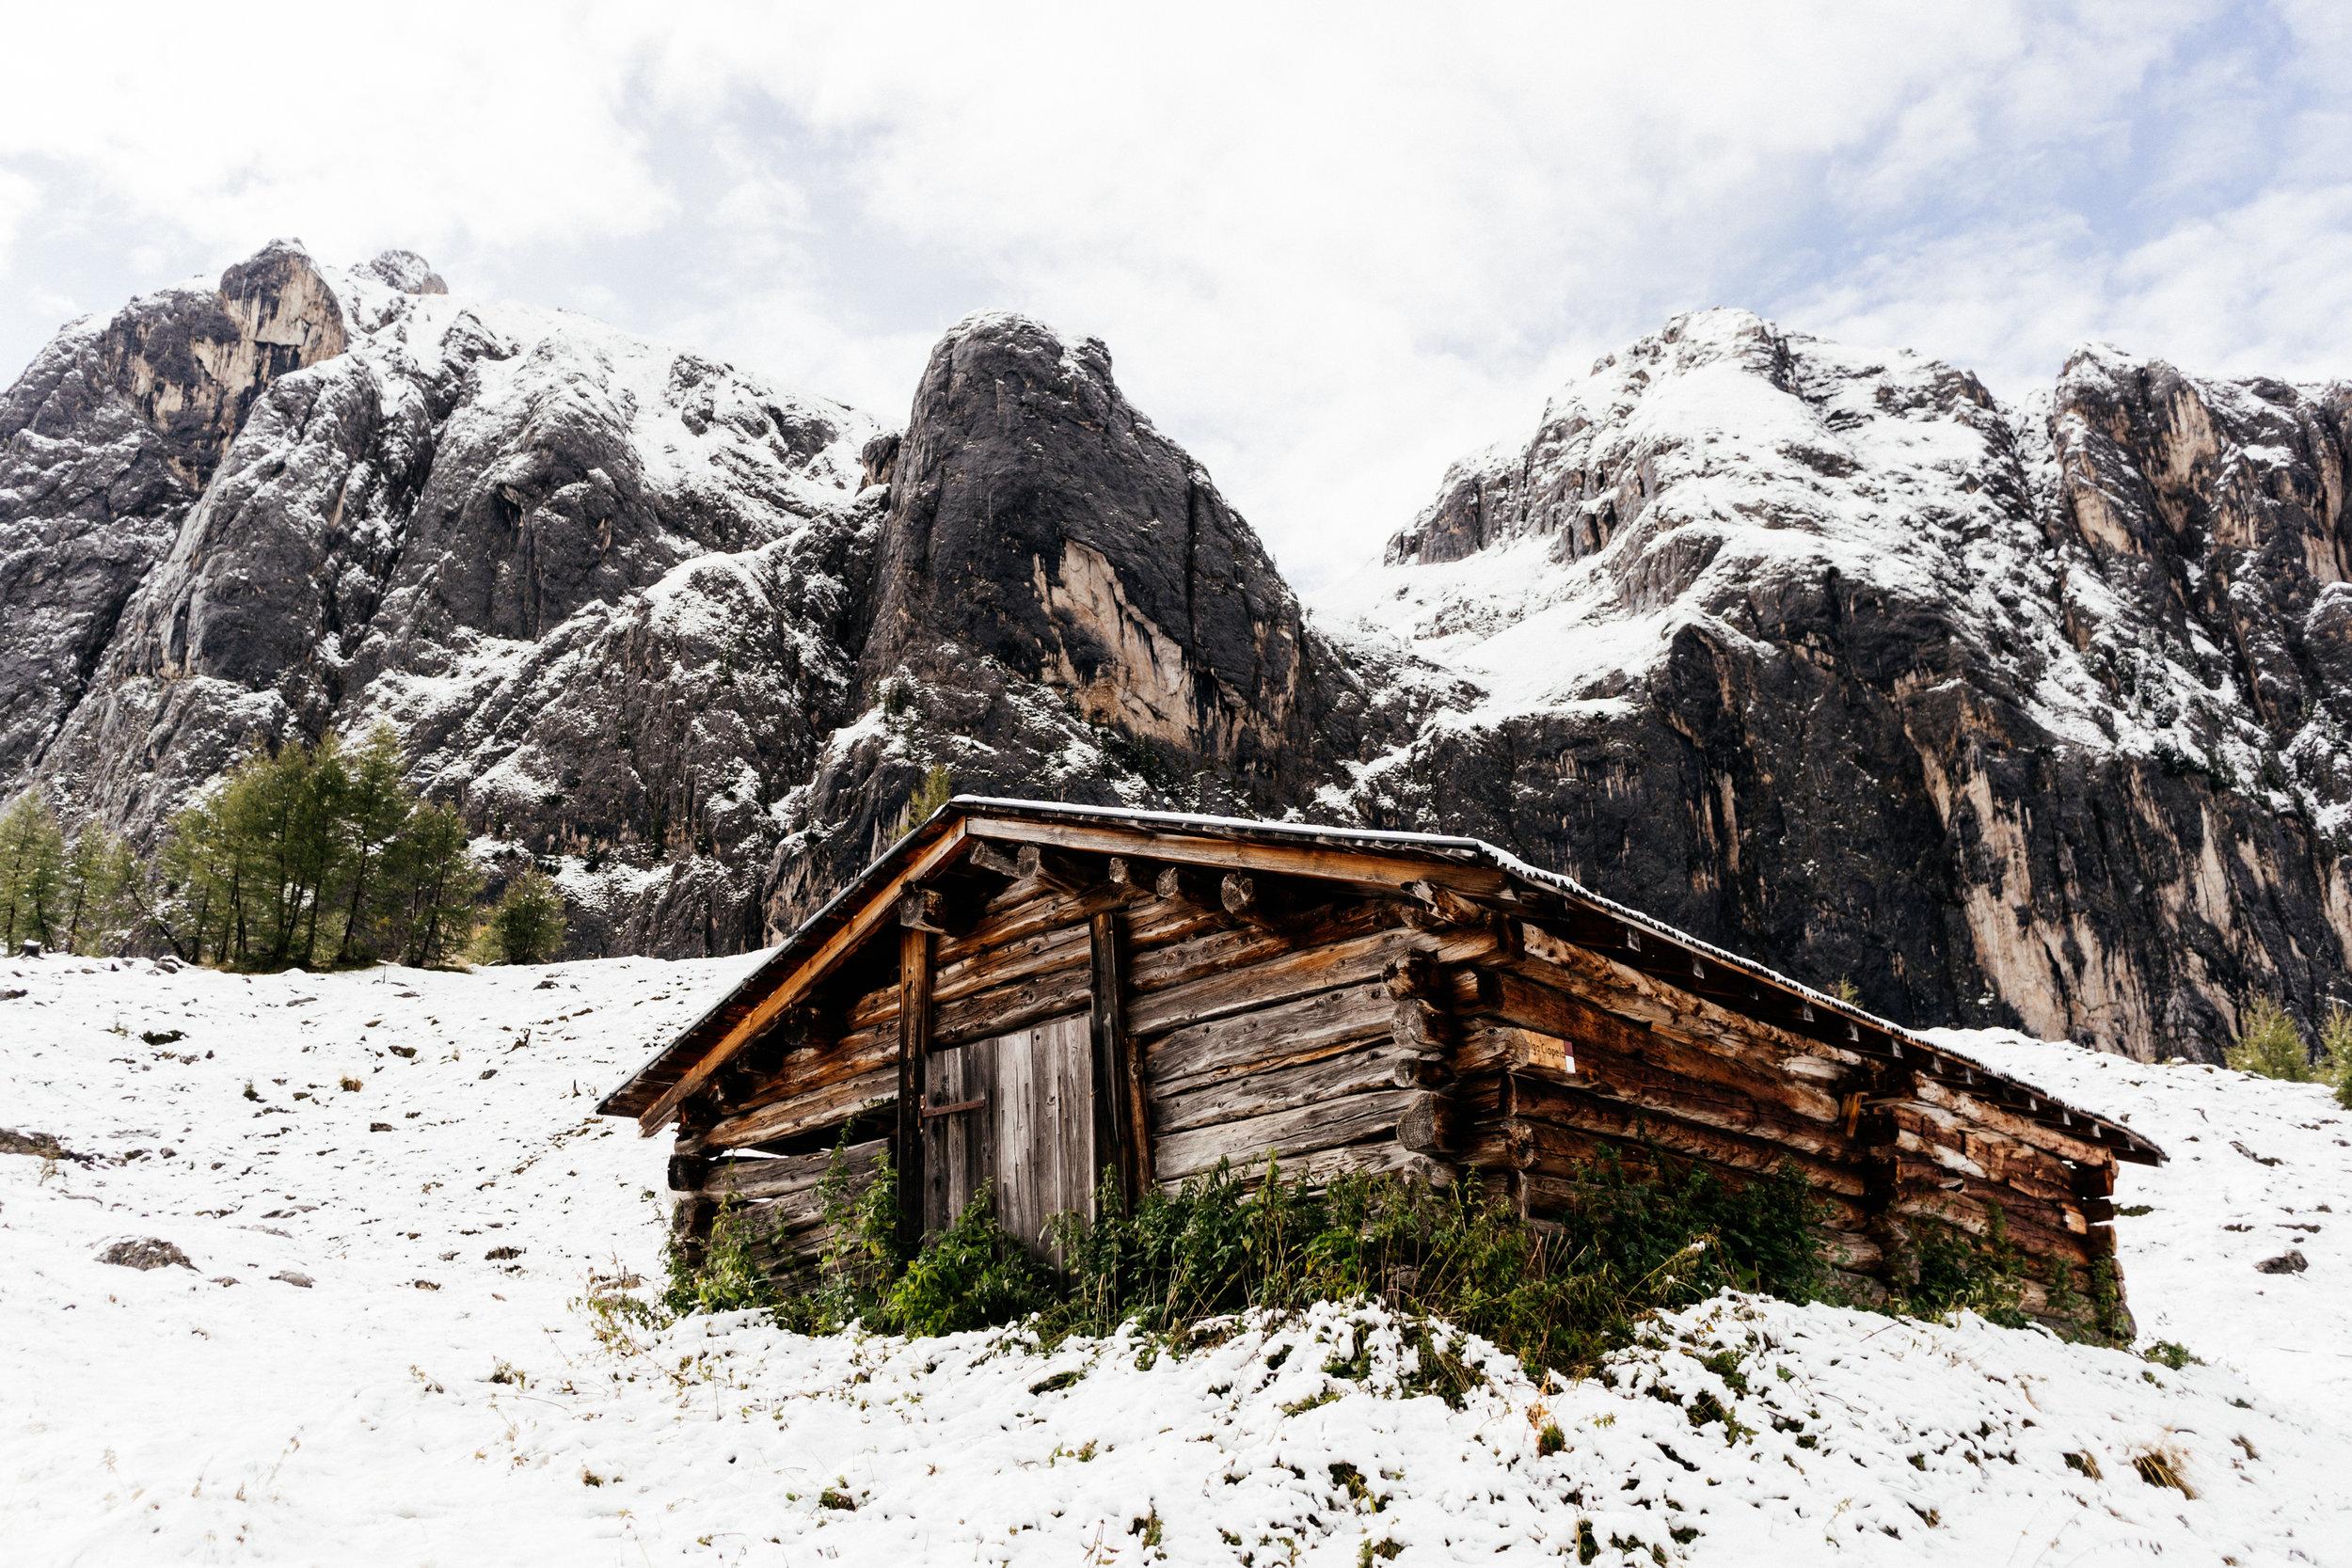 Dolomites-ChrisBrinleeJr-SEP17-103.jpg